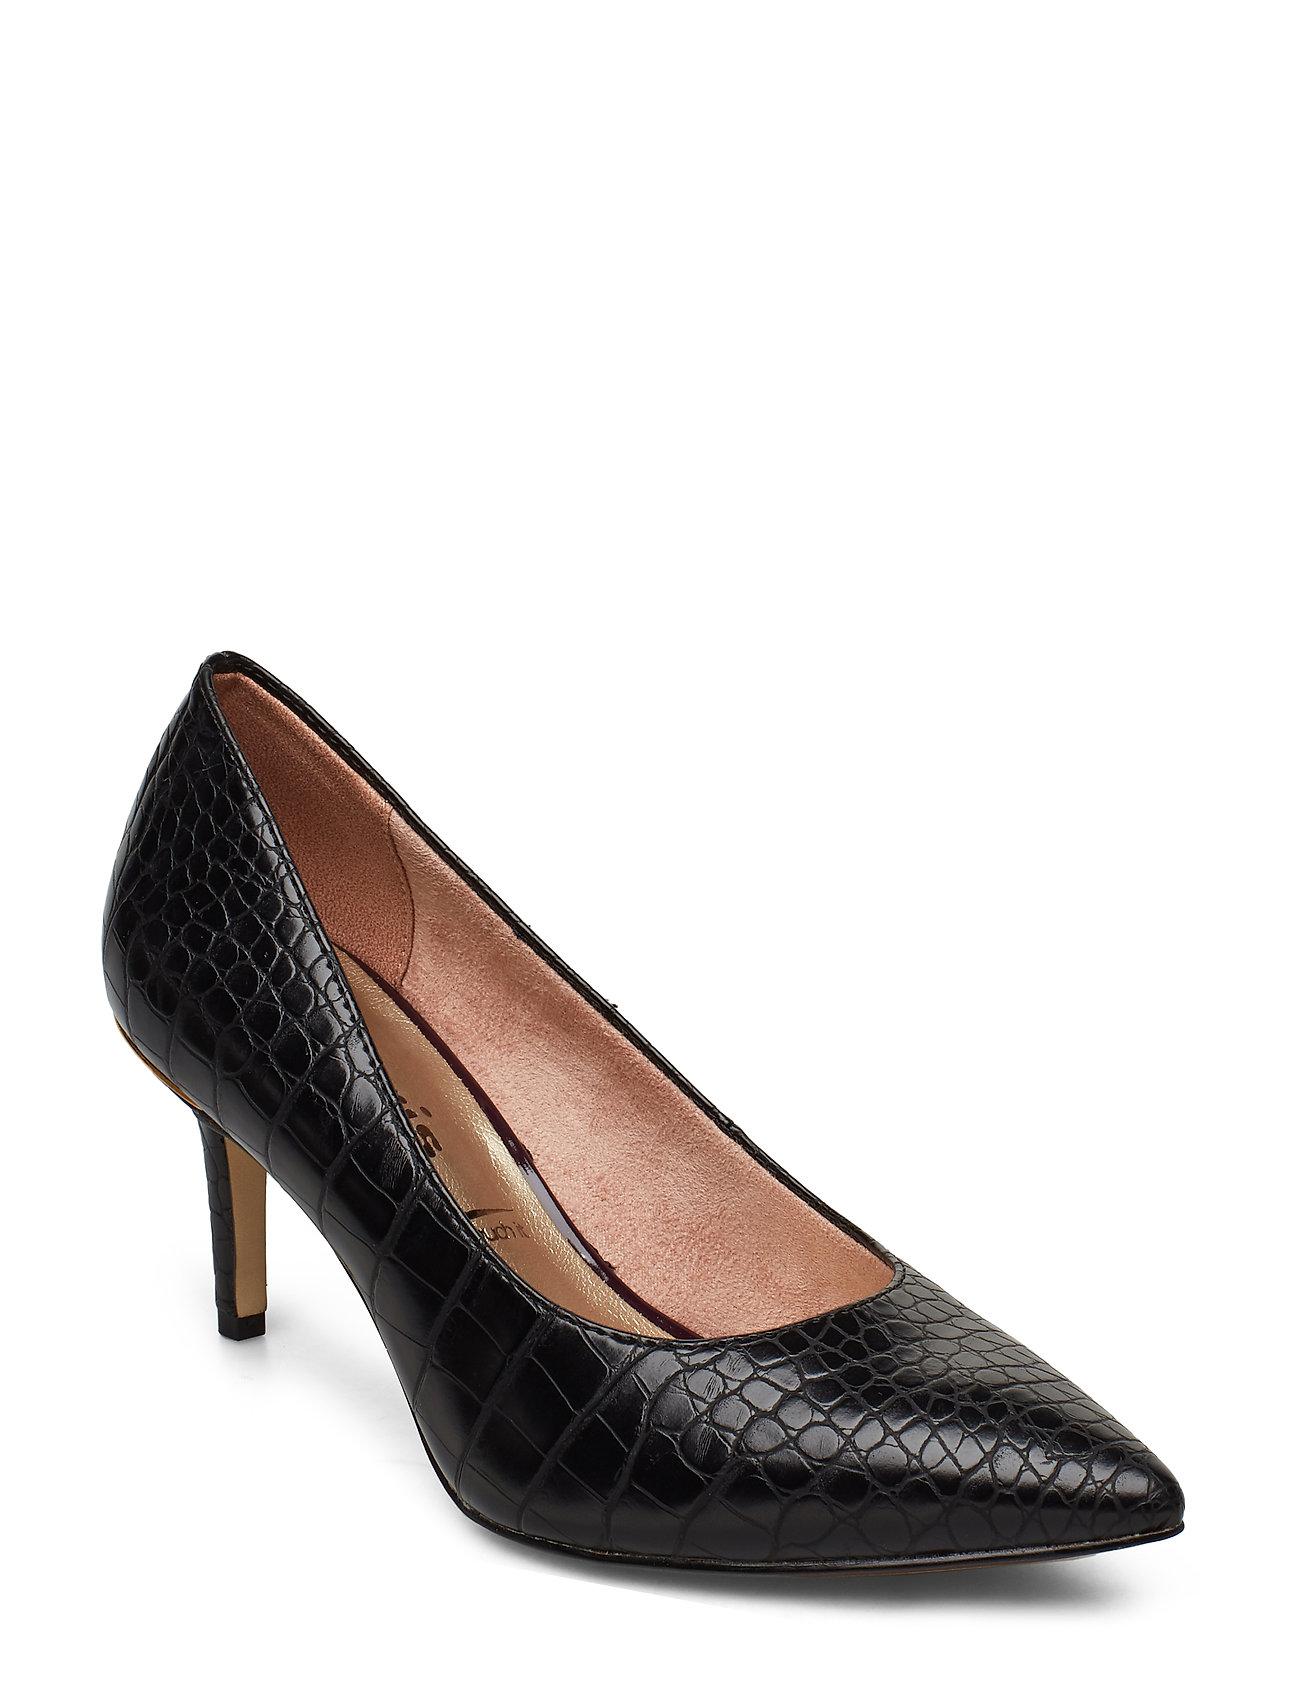 Tamaris Woms Court Shoe - BLACK CROCO